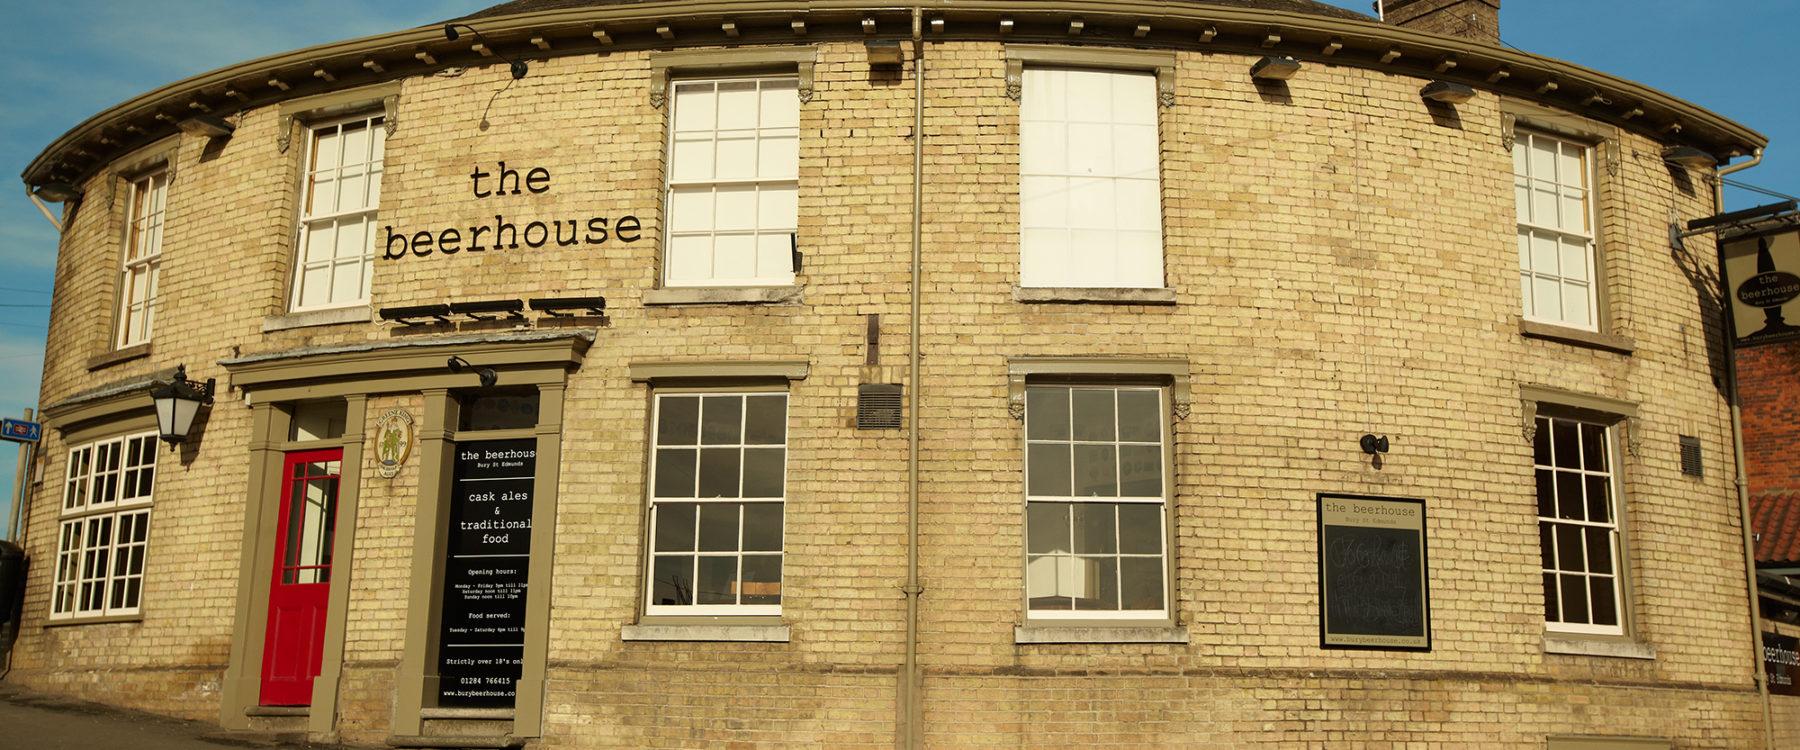 de0aaf74e5b6b1 Opening hours - The Beerhouse Bury St Edmunds